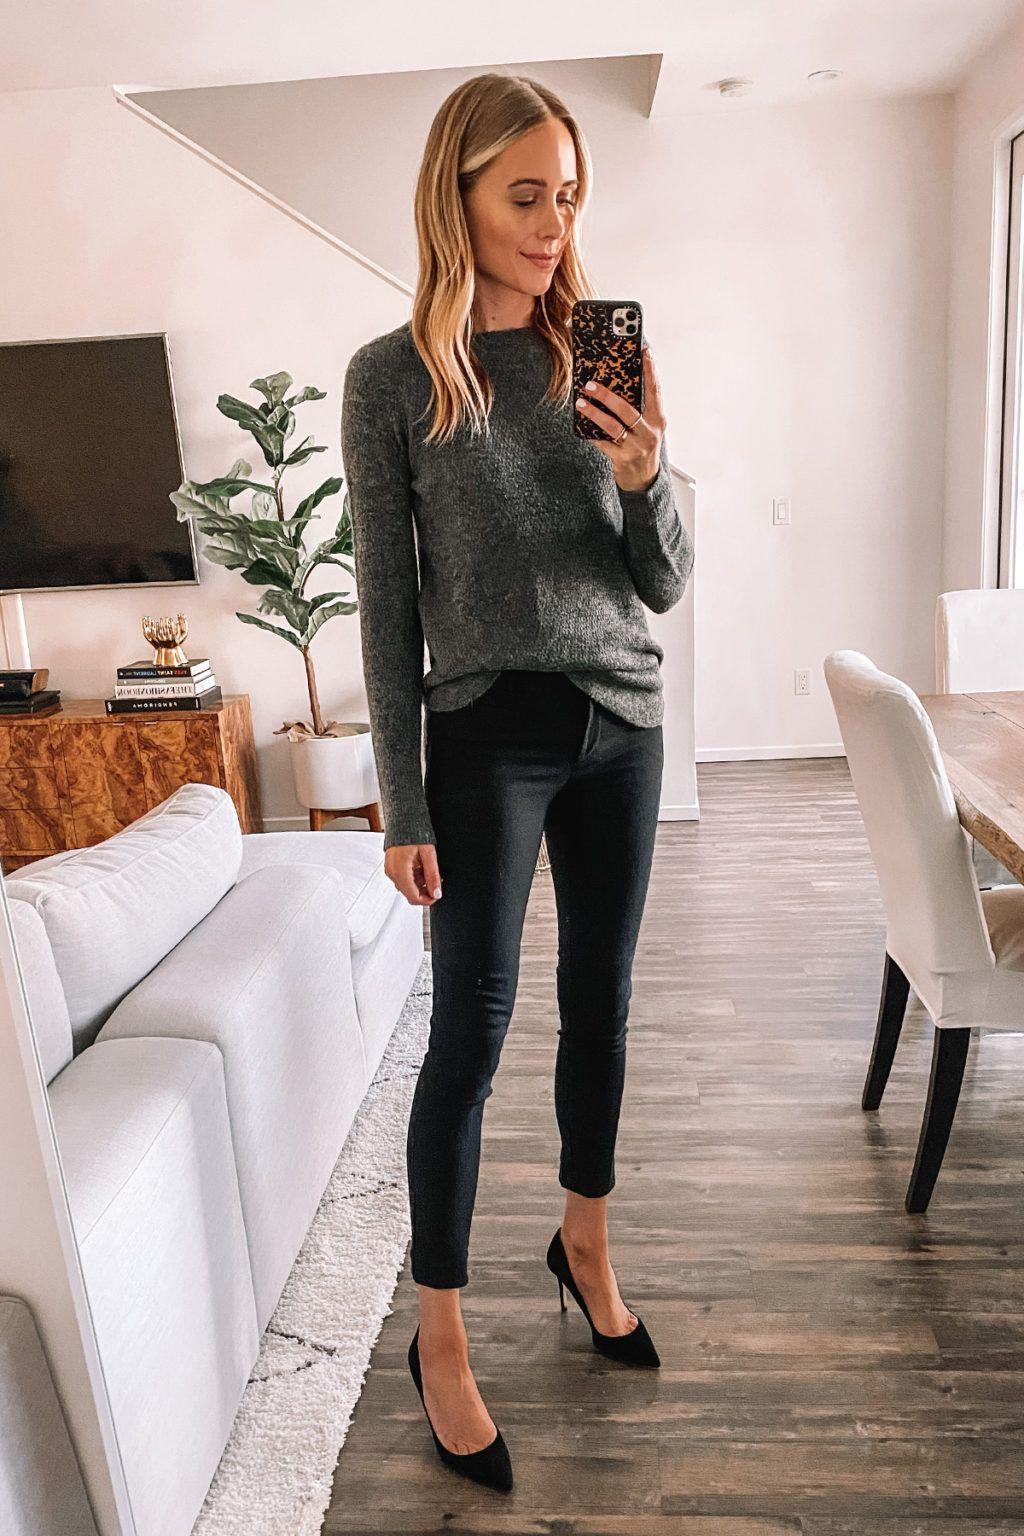 Fashion Jackson Loft Try On Haul Workwear Grey Sweater Black Dress Pants Black Pumps Outfit Fashion Jackson Dress Pants Outfits Pumps Outfit [ 1536 x 1024 Pixel ]